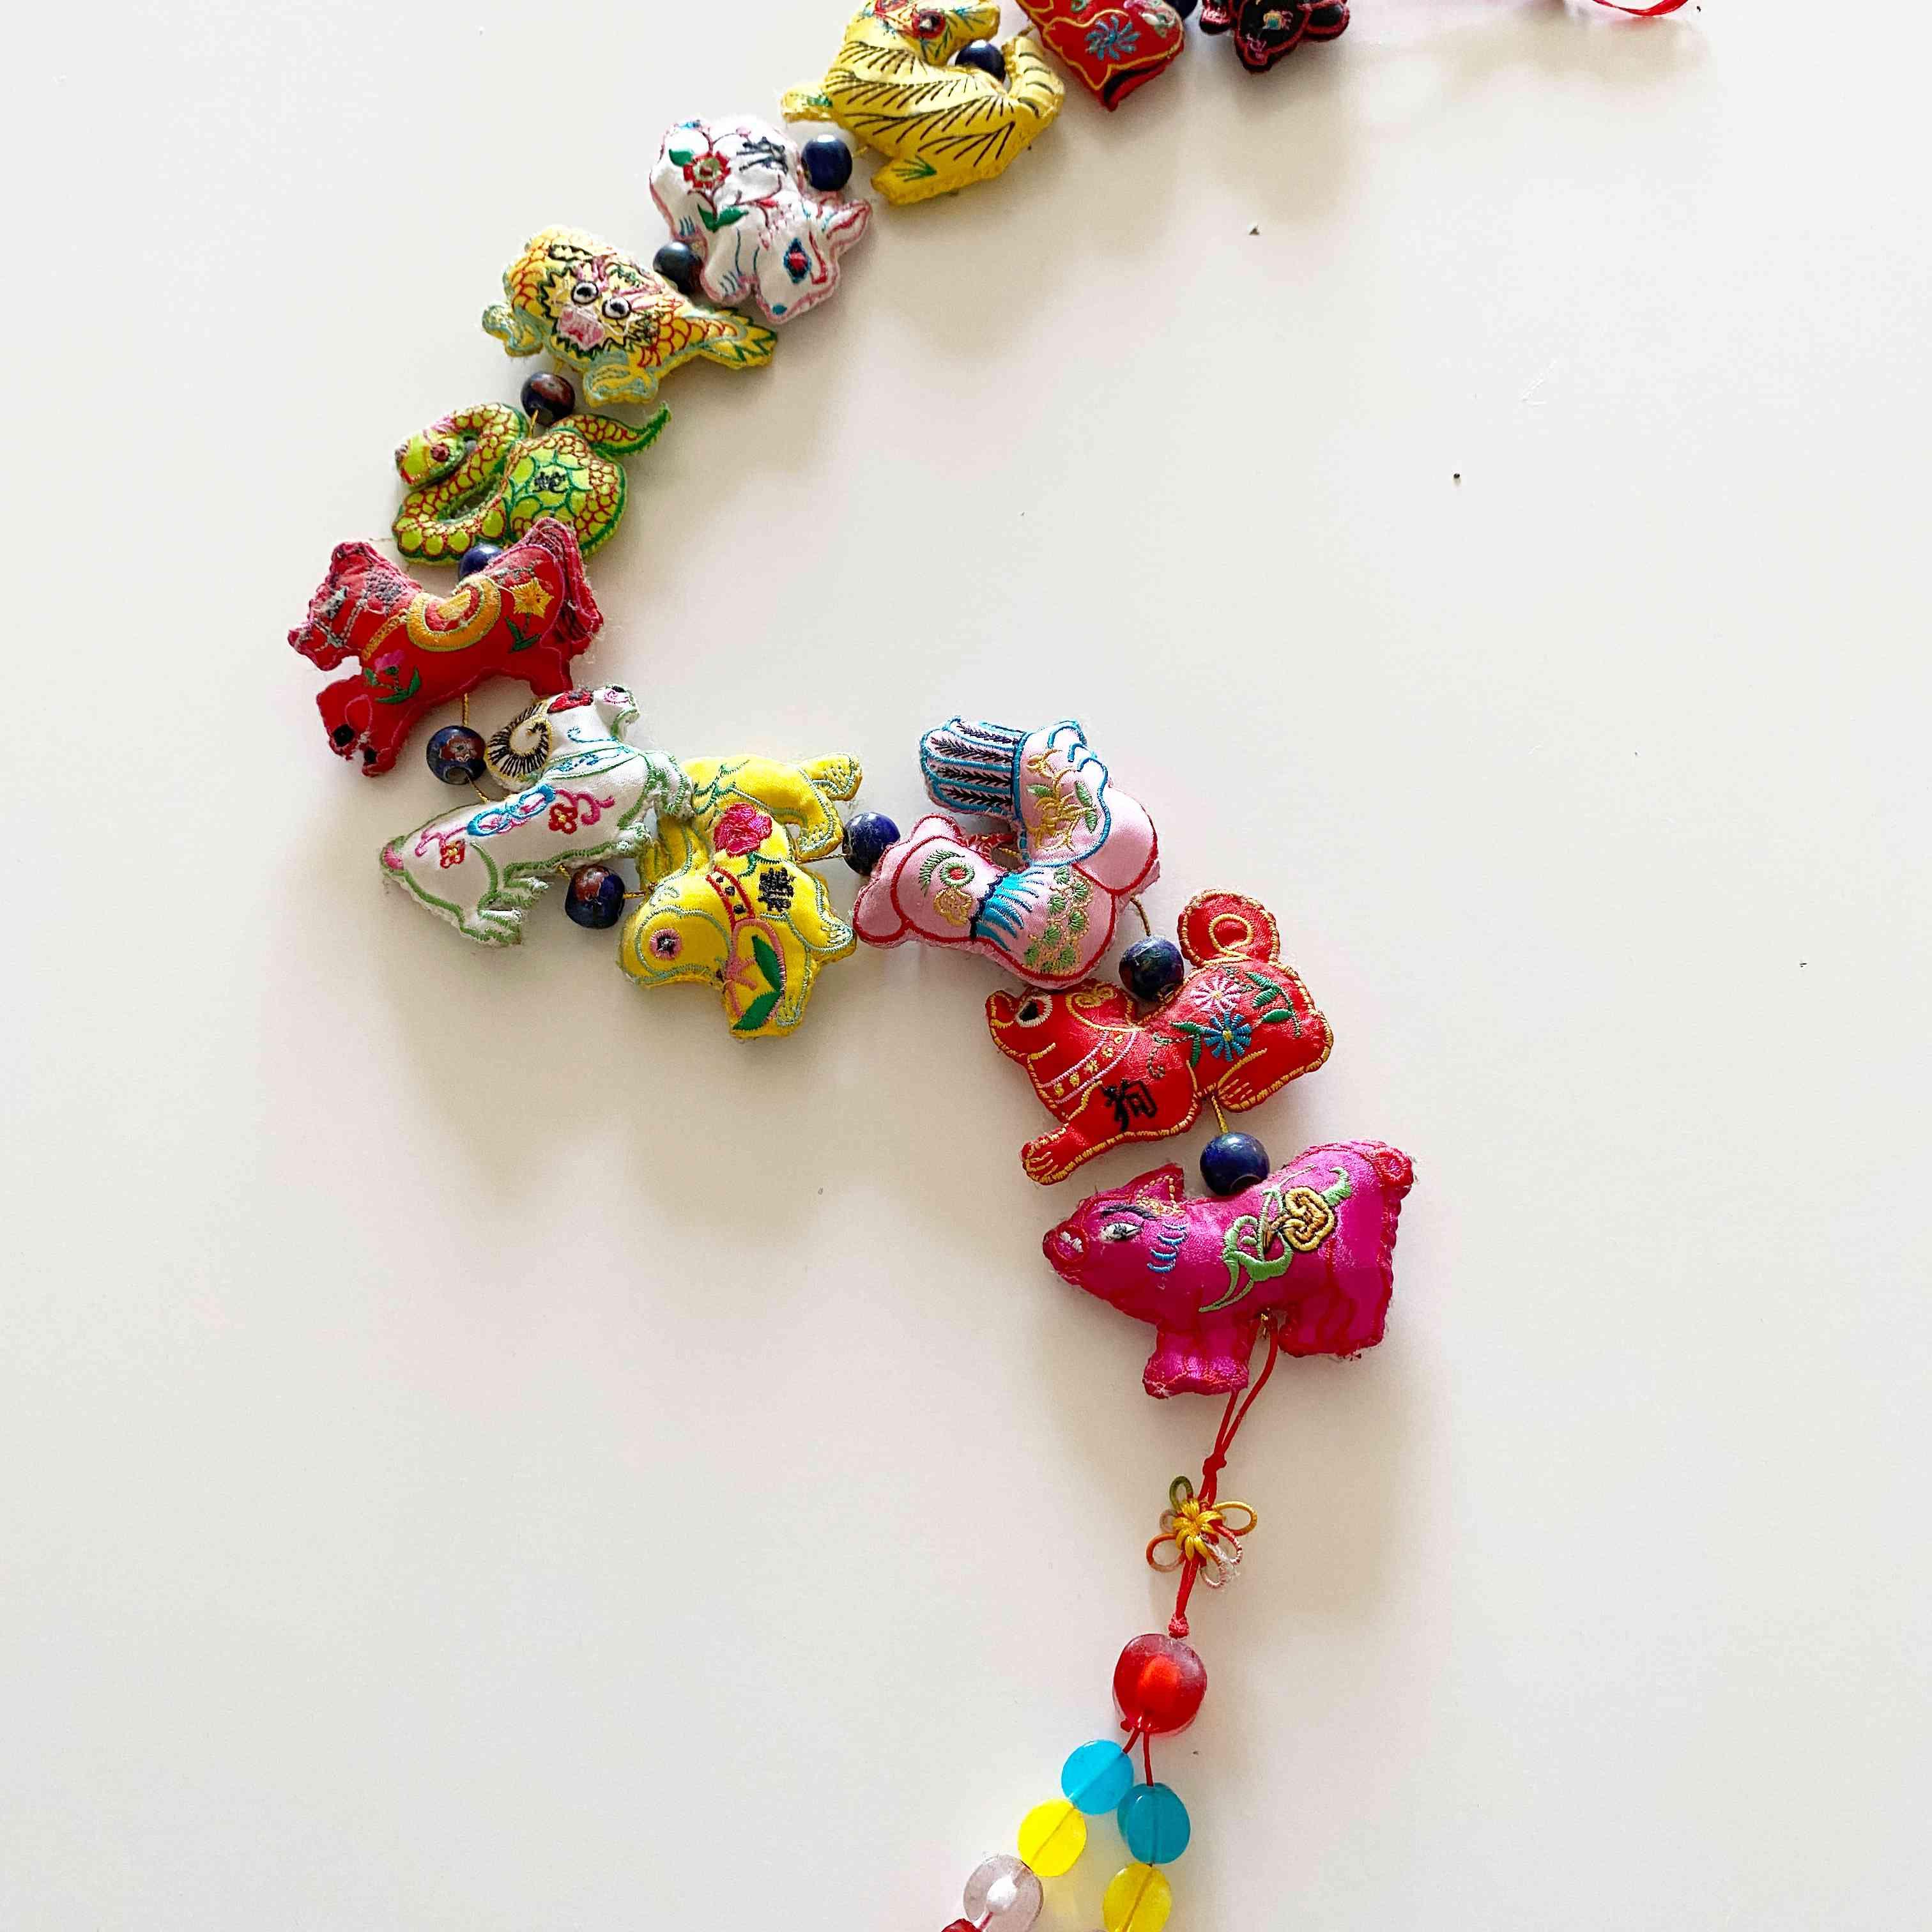 12 zodiac animals on a string